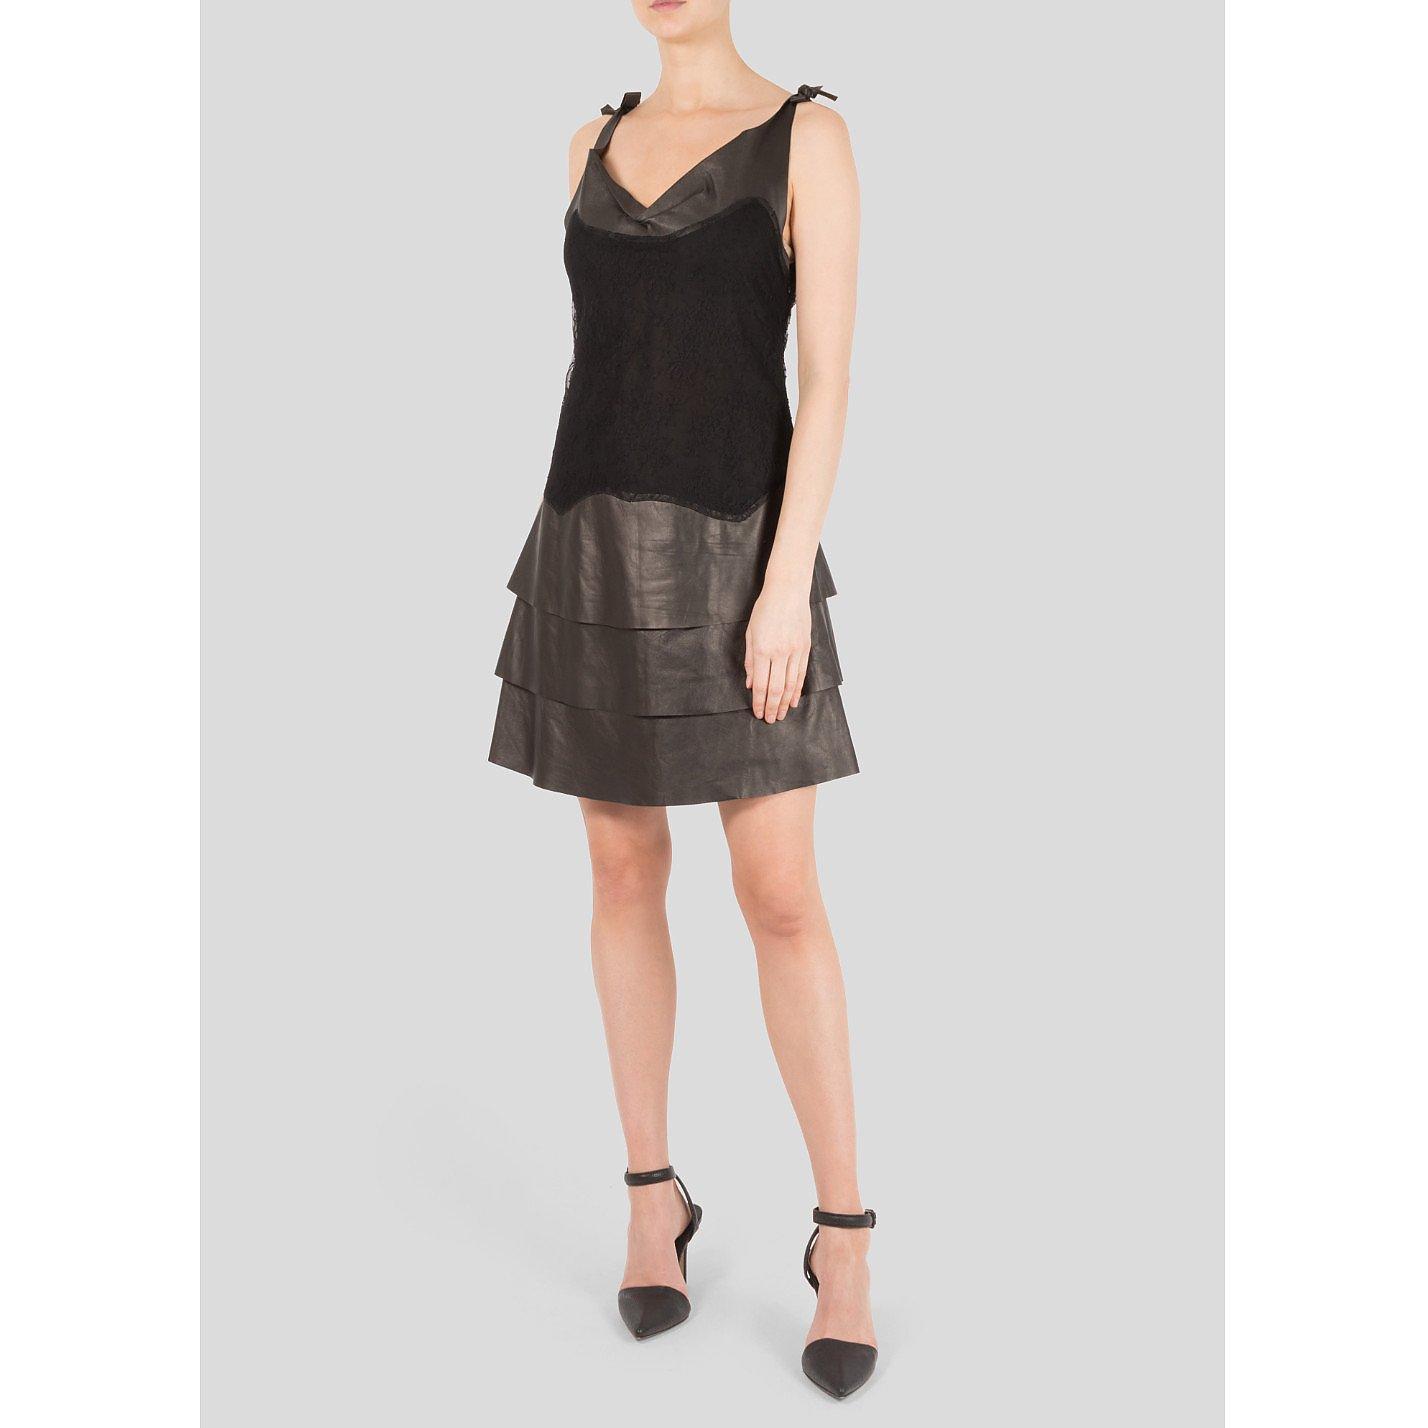 Valentino Leather & Lace Mini Dress